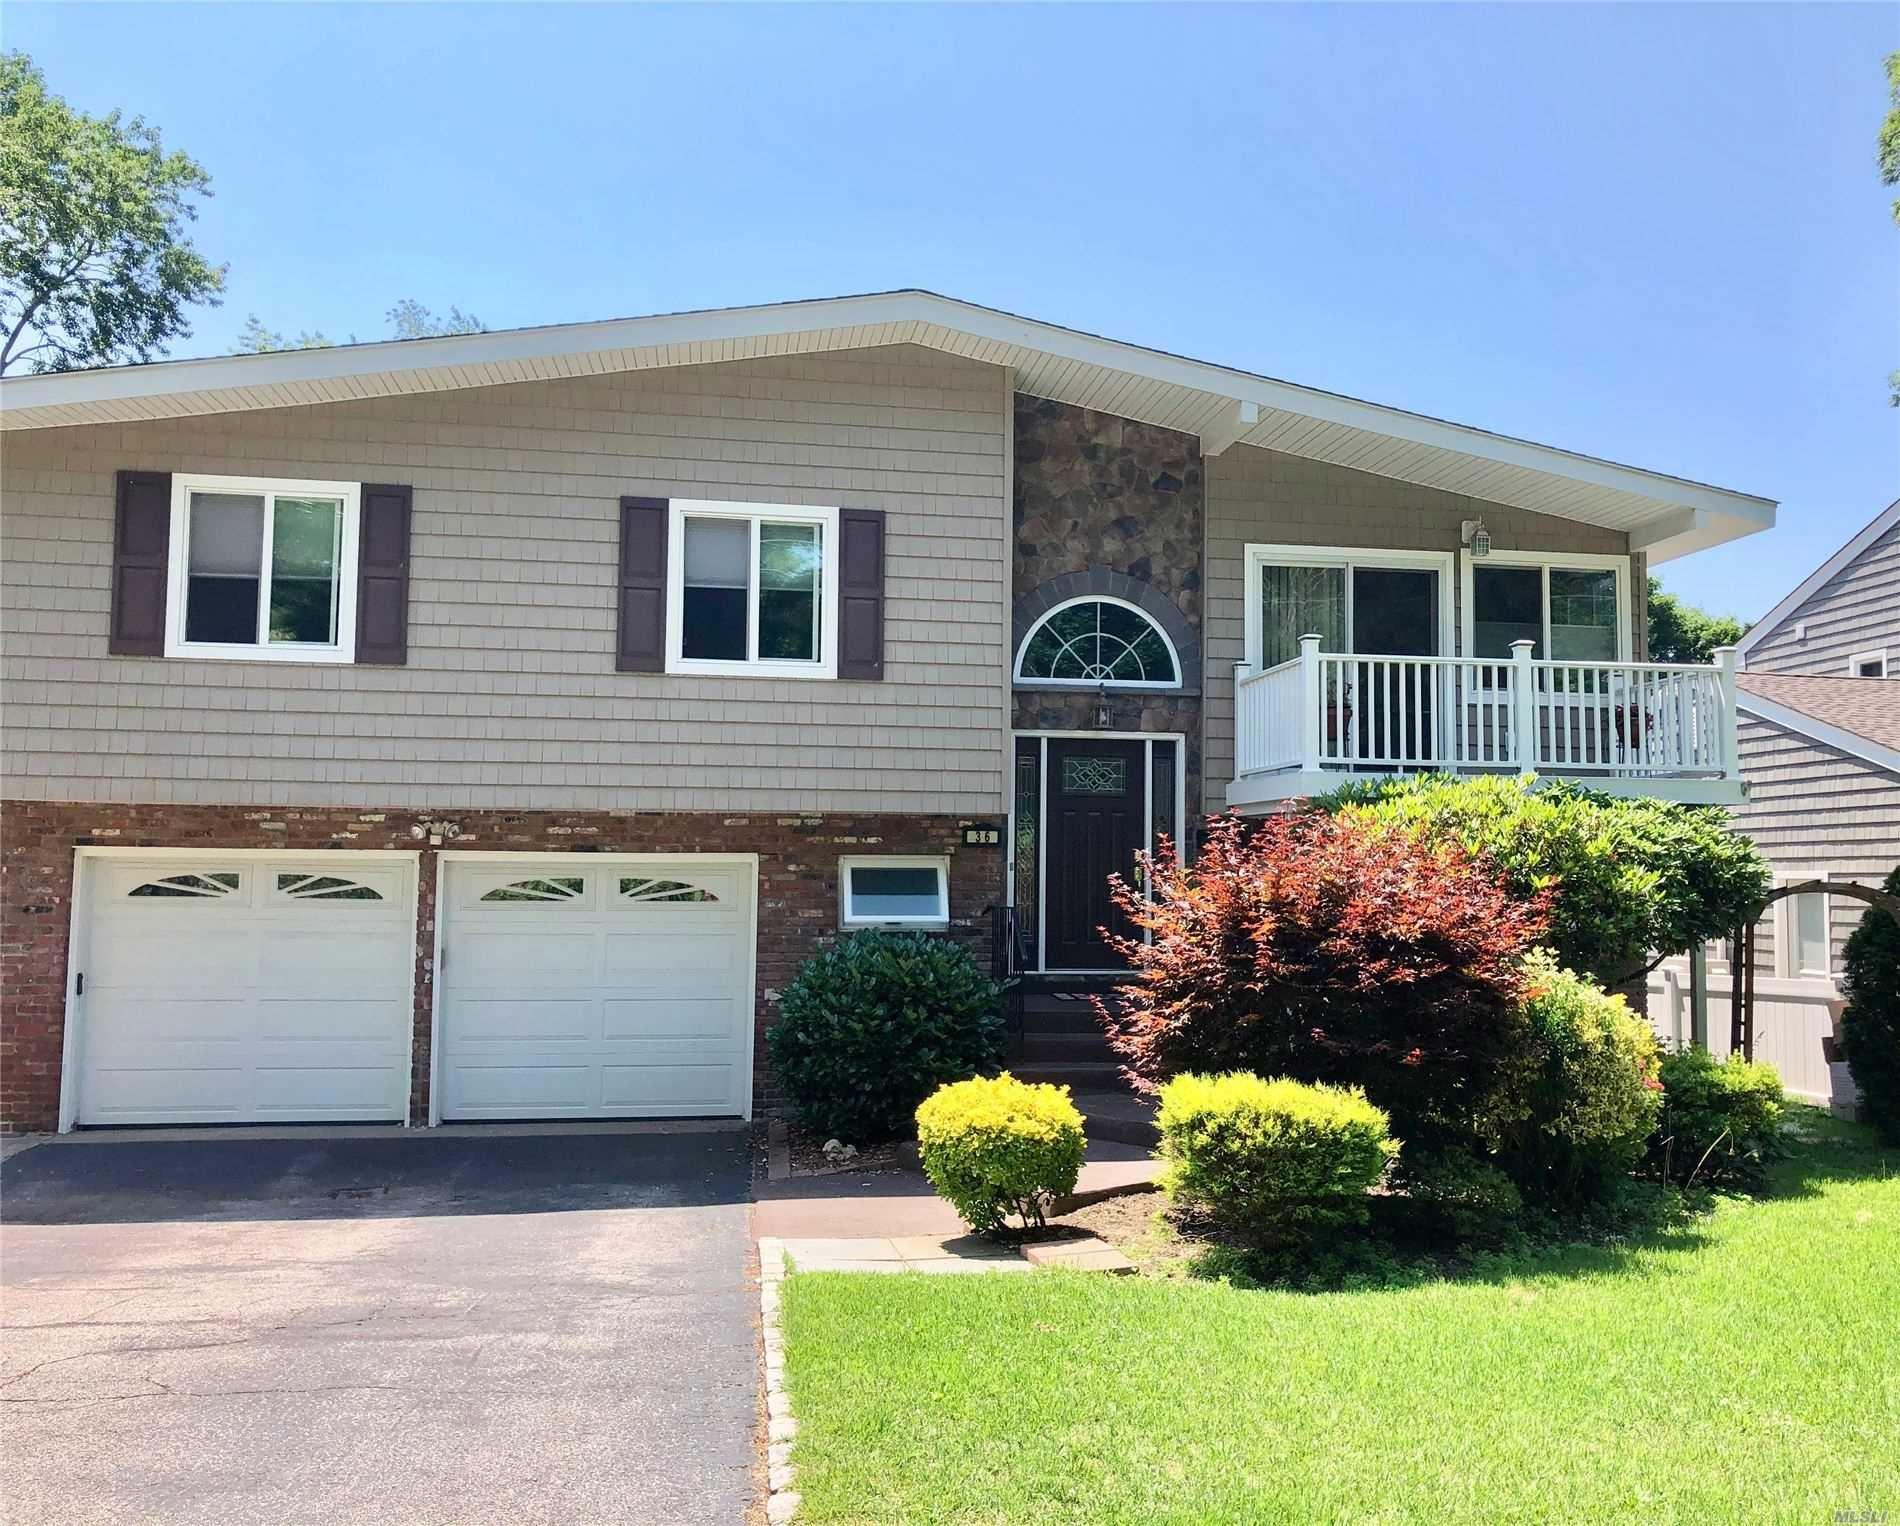 36 Cornwells Lane, Port Washington, NY 11050 - MLS#: 3230201